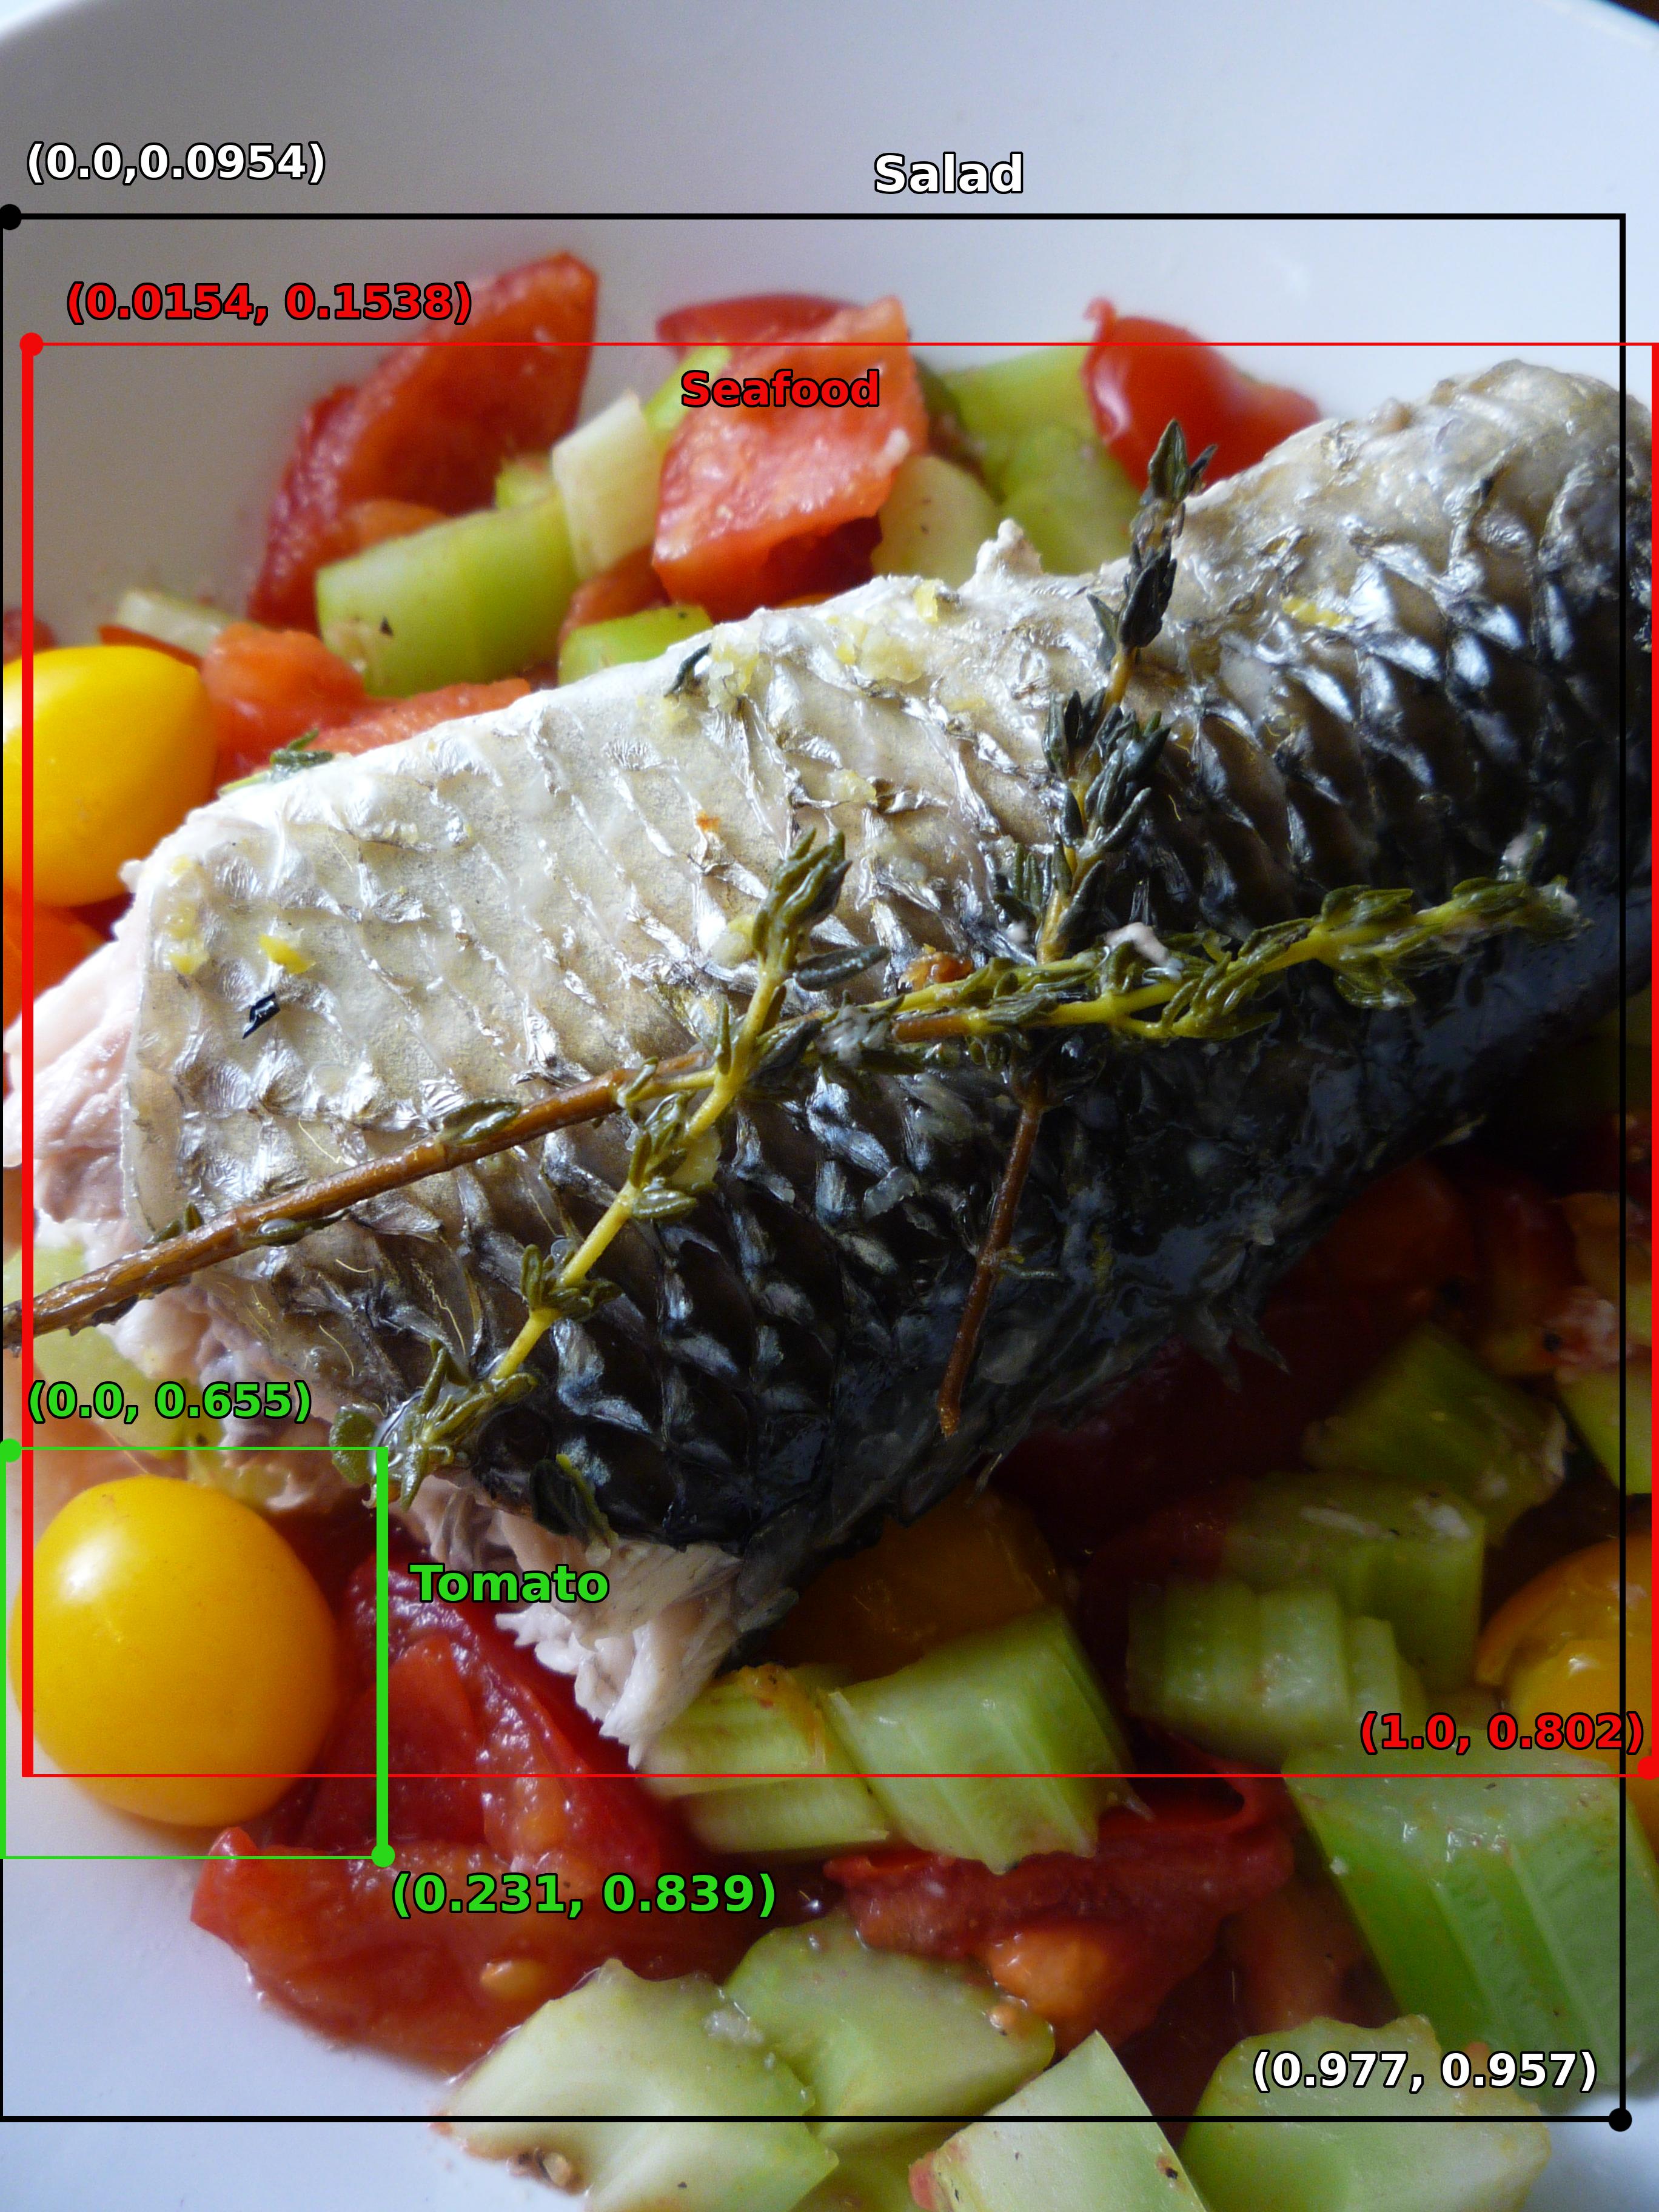 dataset image example